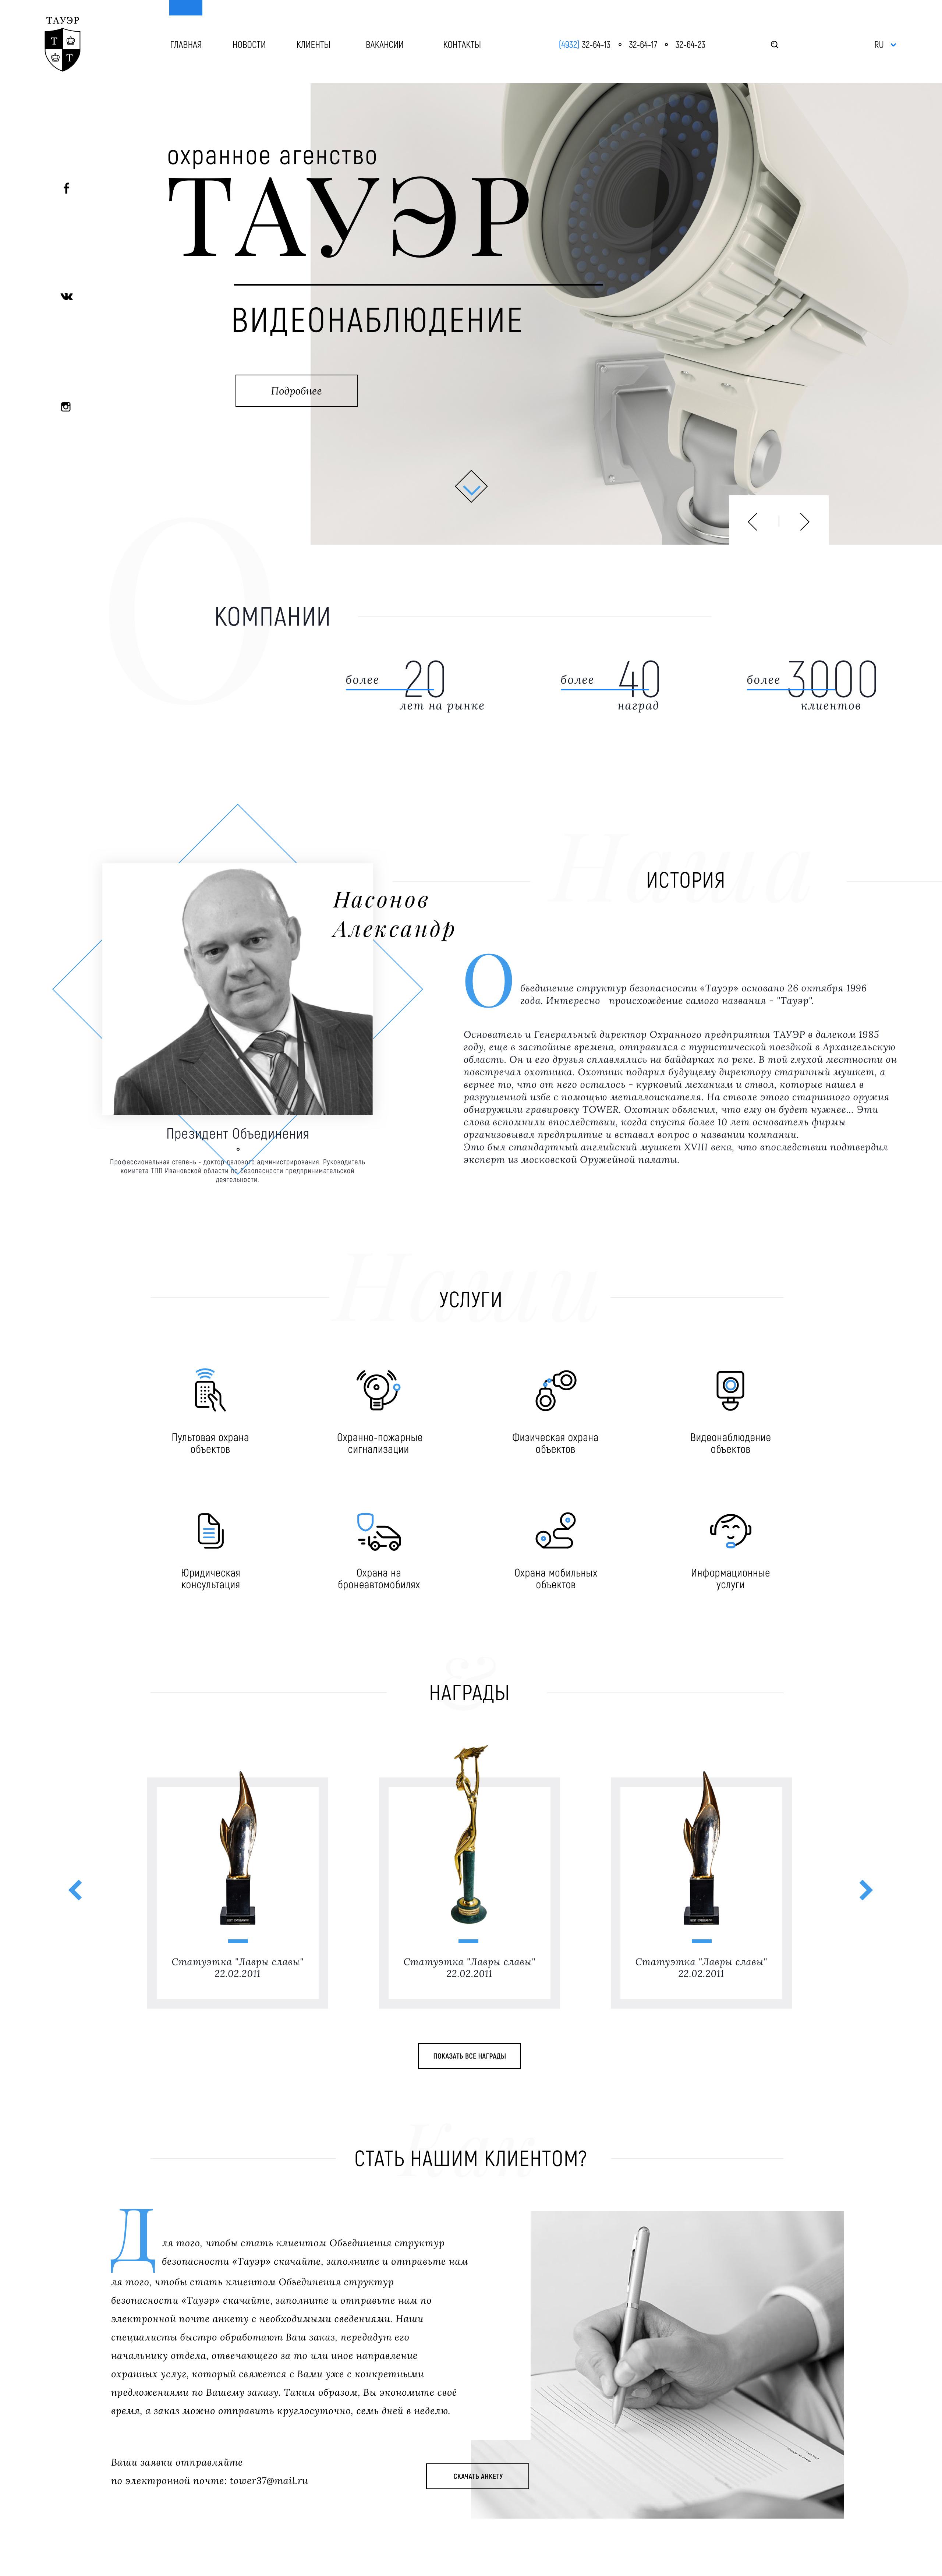 Редизайн существующего сайта компании (ЗАВЕРШЁН) фото f_25058fa5a8e86caa.jpg